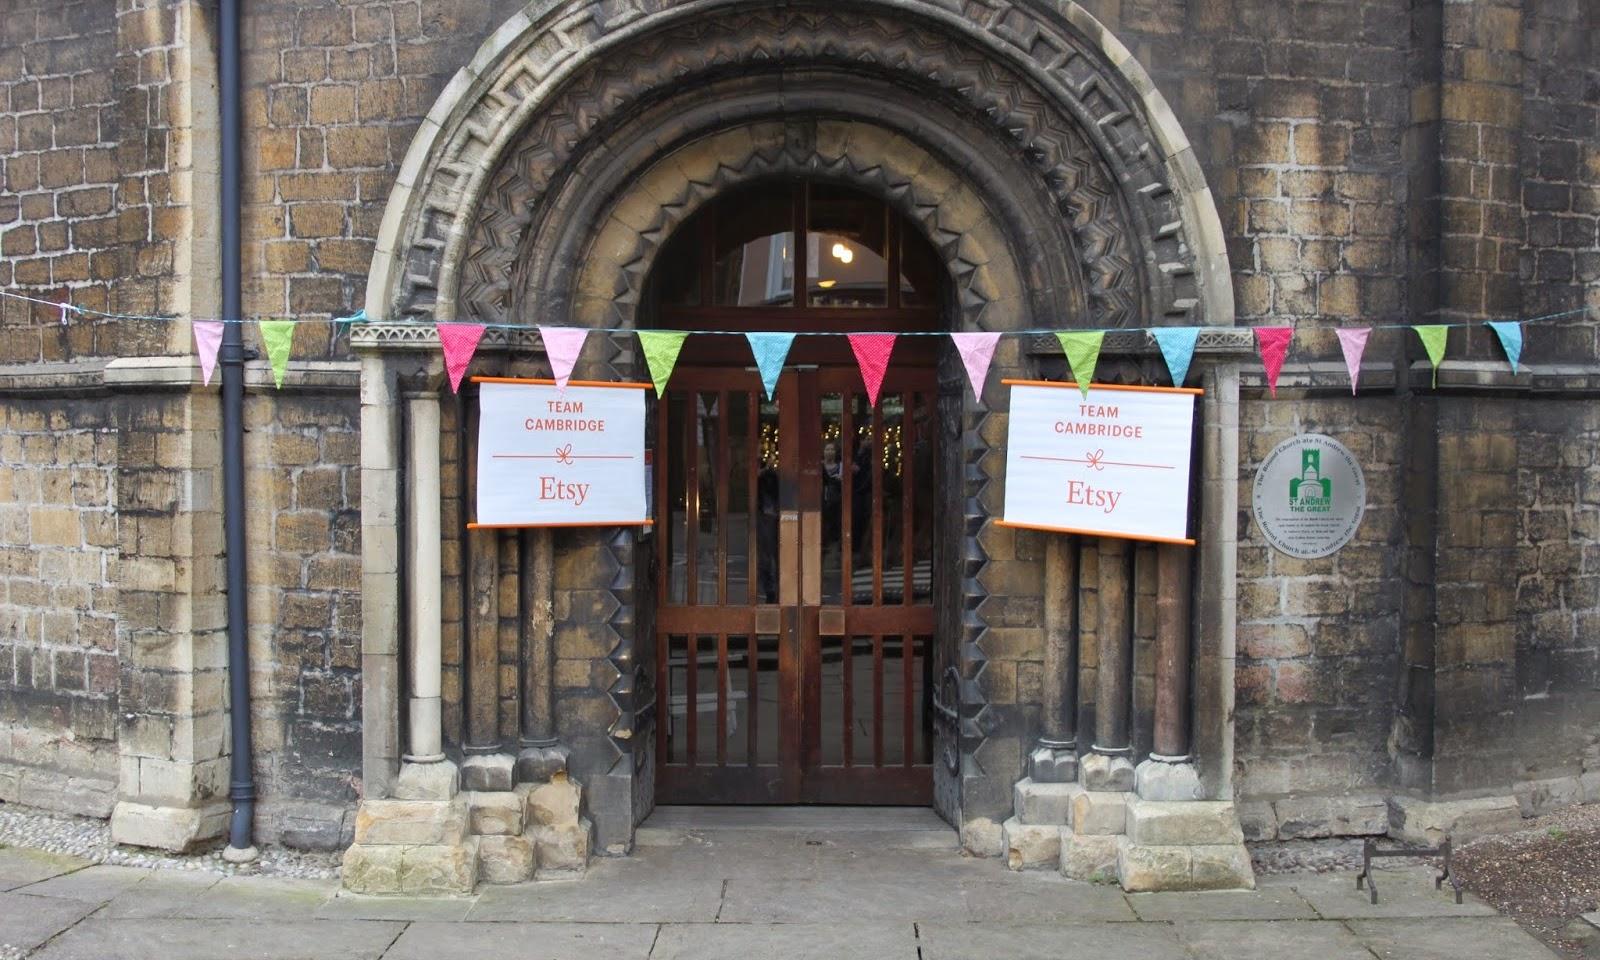 Clashing Time talks Cambridge Etsy pop-up shop